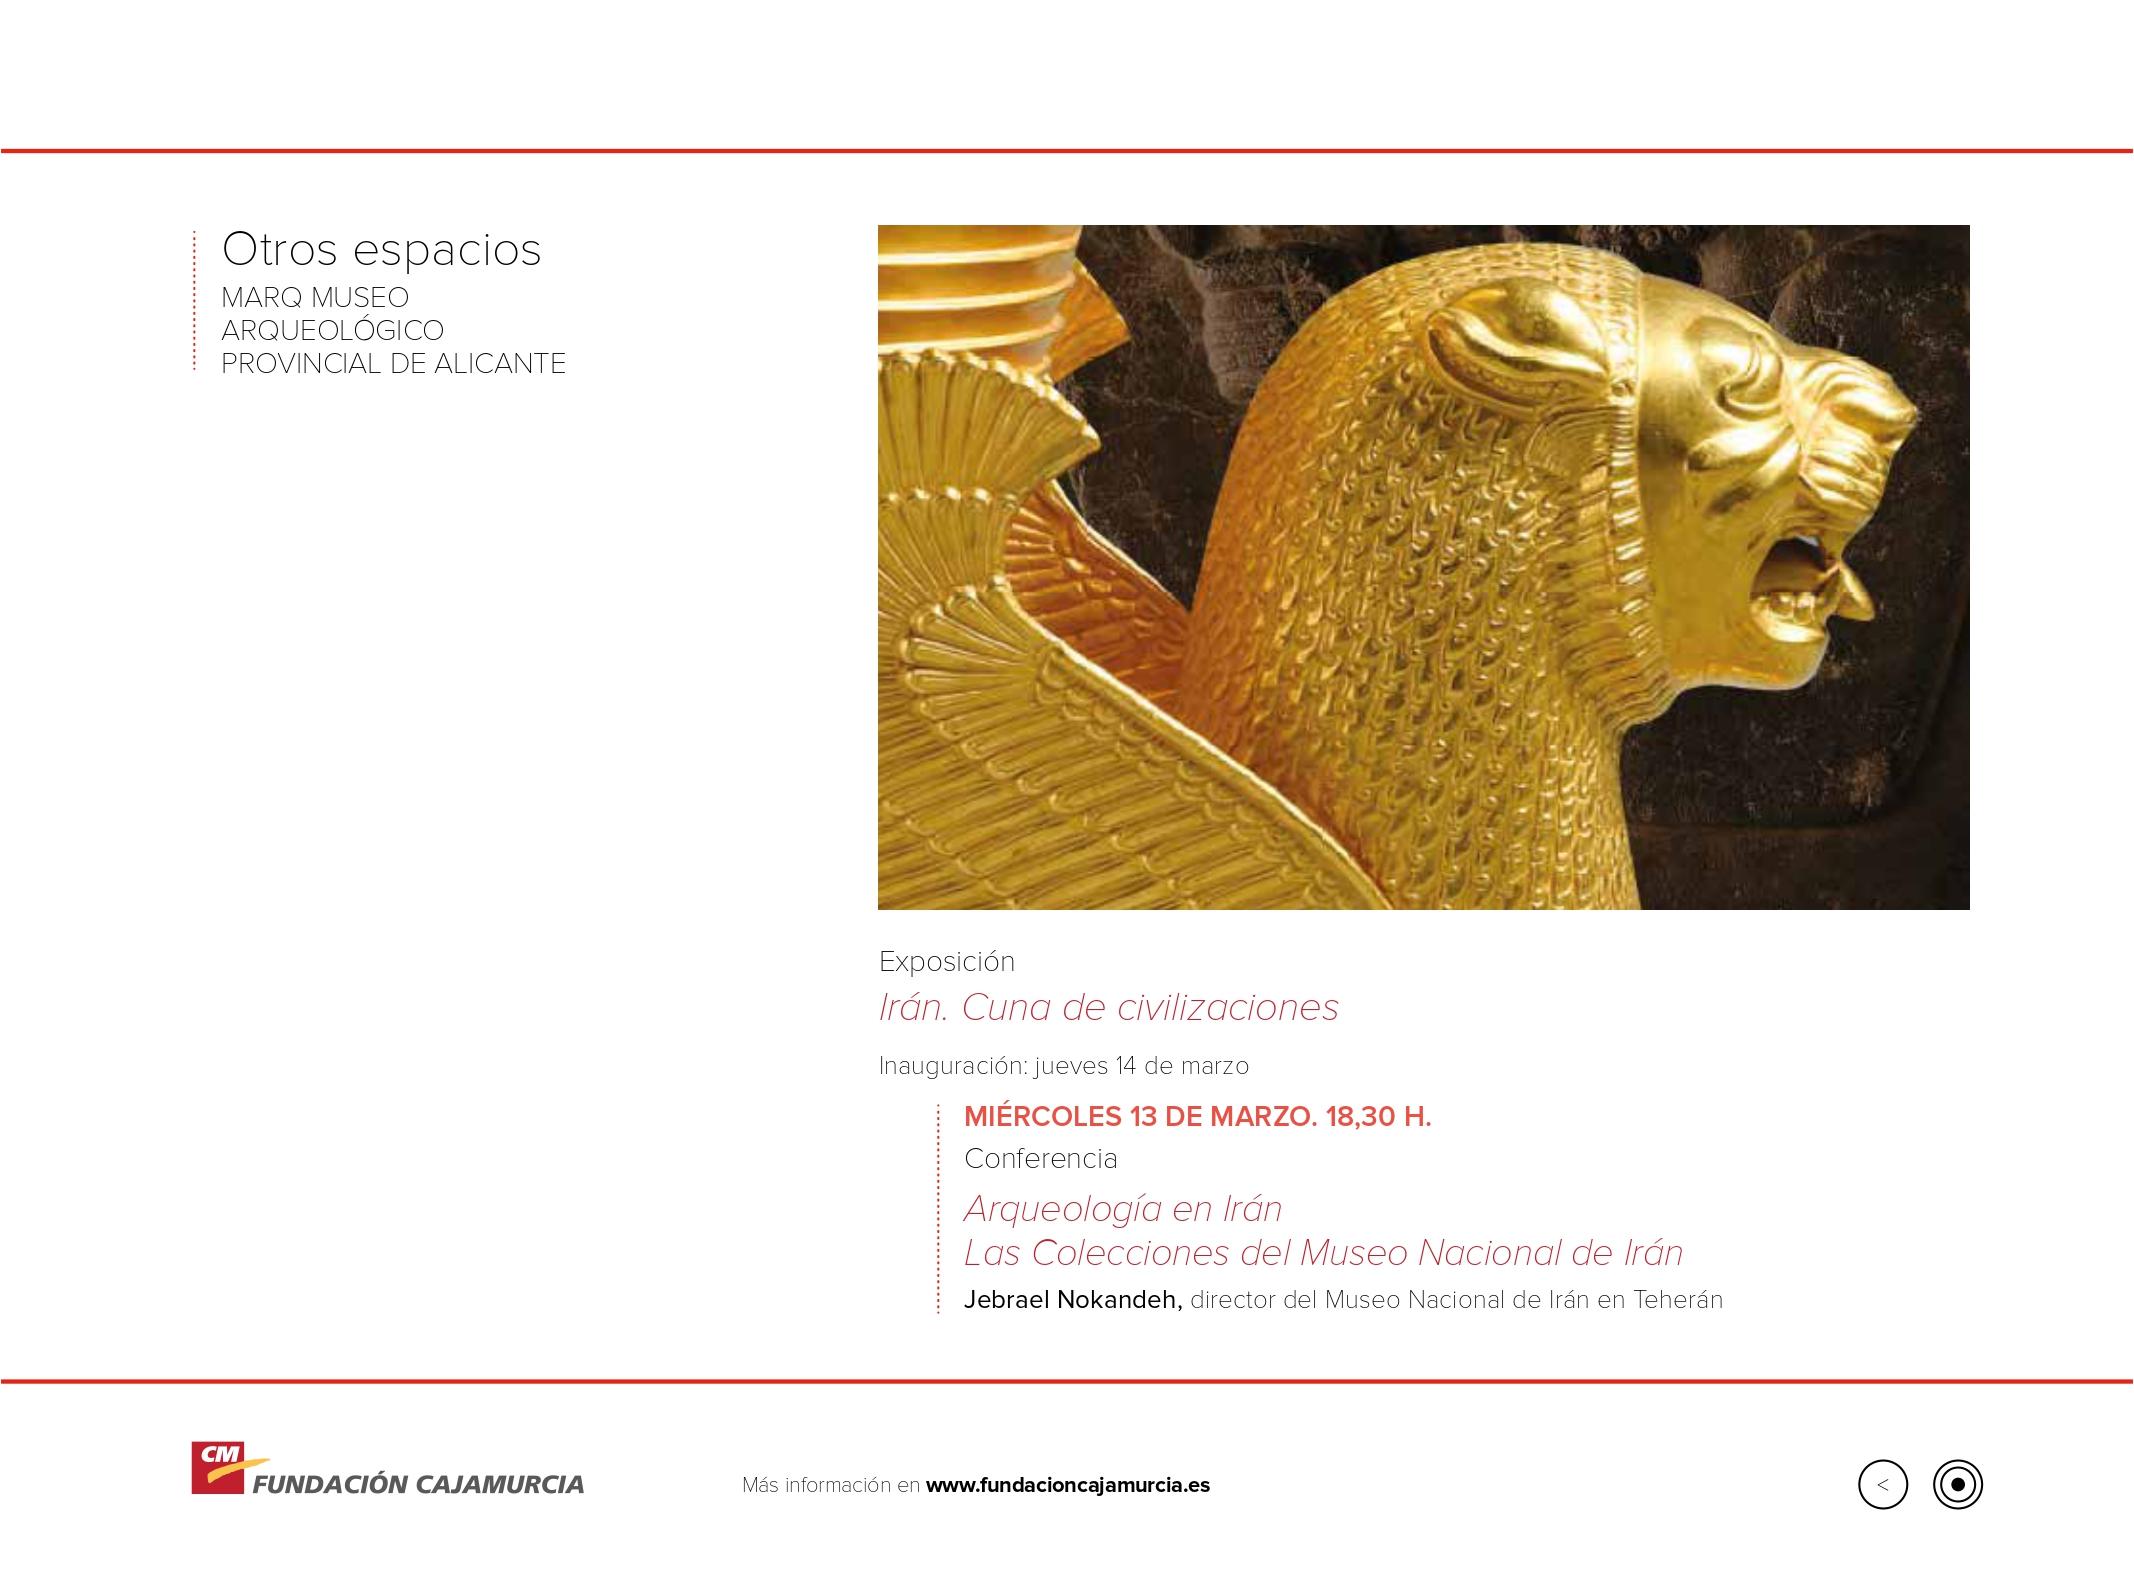 agenda-cajamurcia_page-0020.jpg